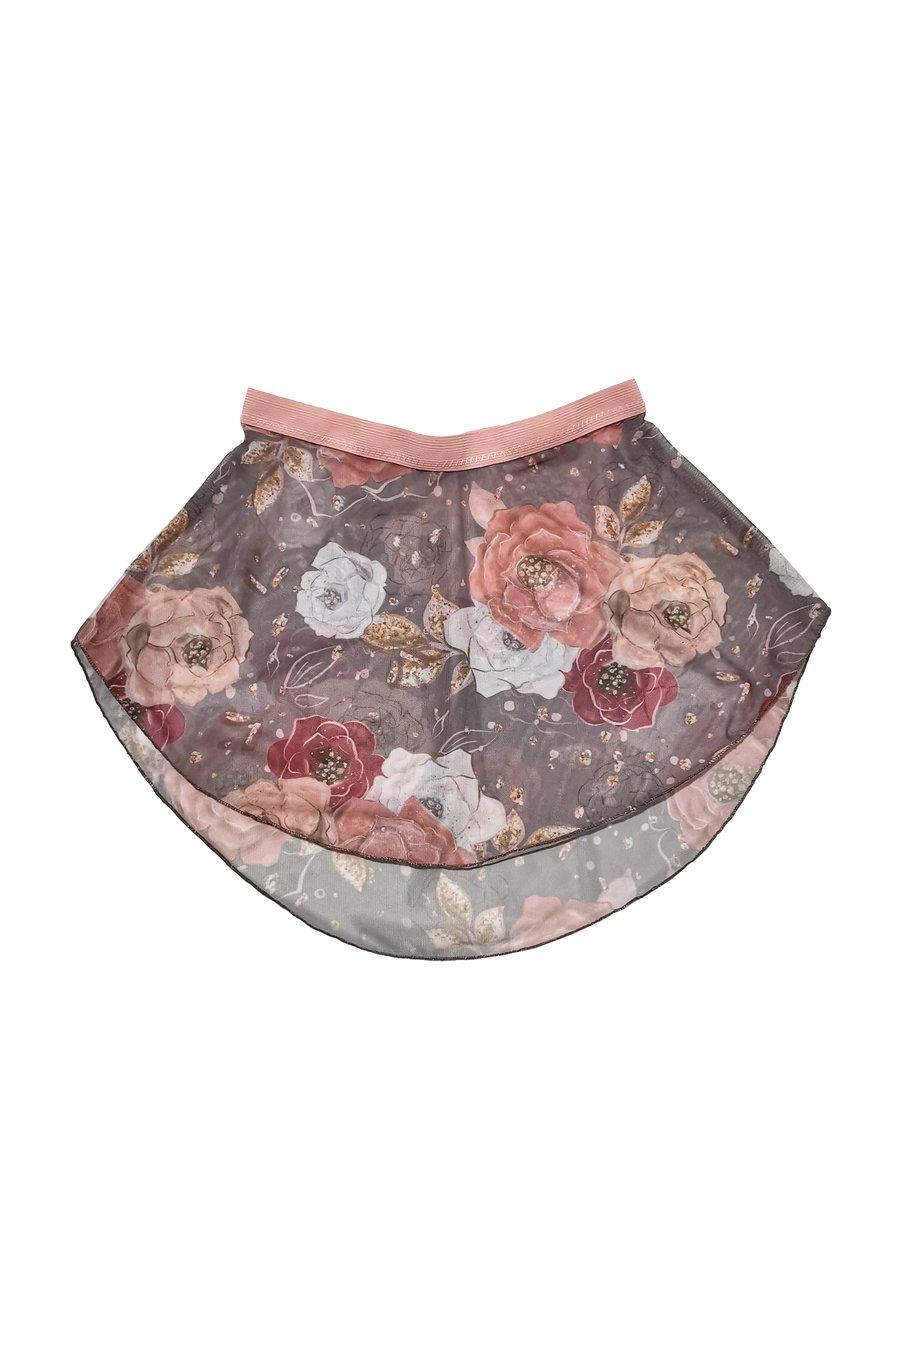 Image of BALANCHINE skirt - Pattern Mesh